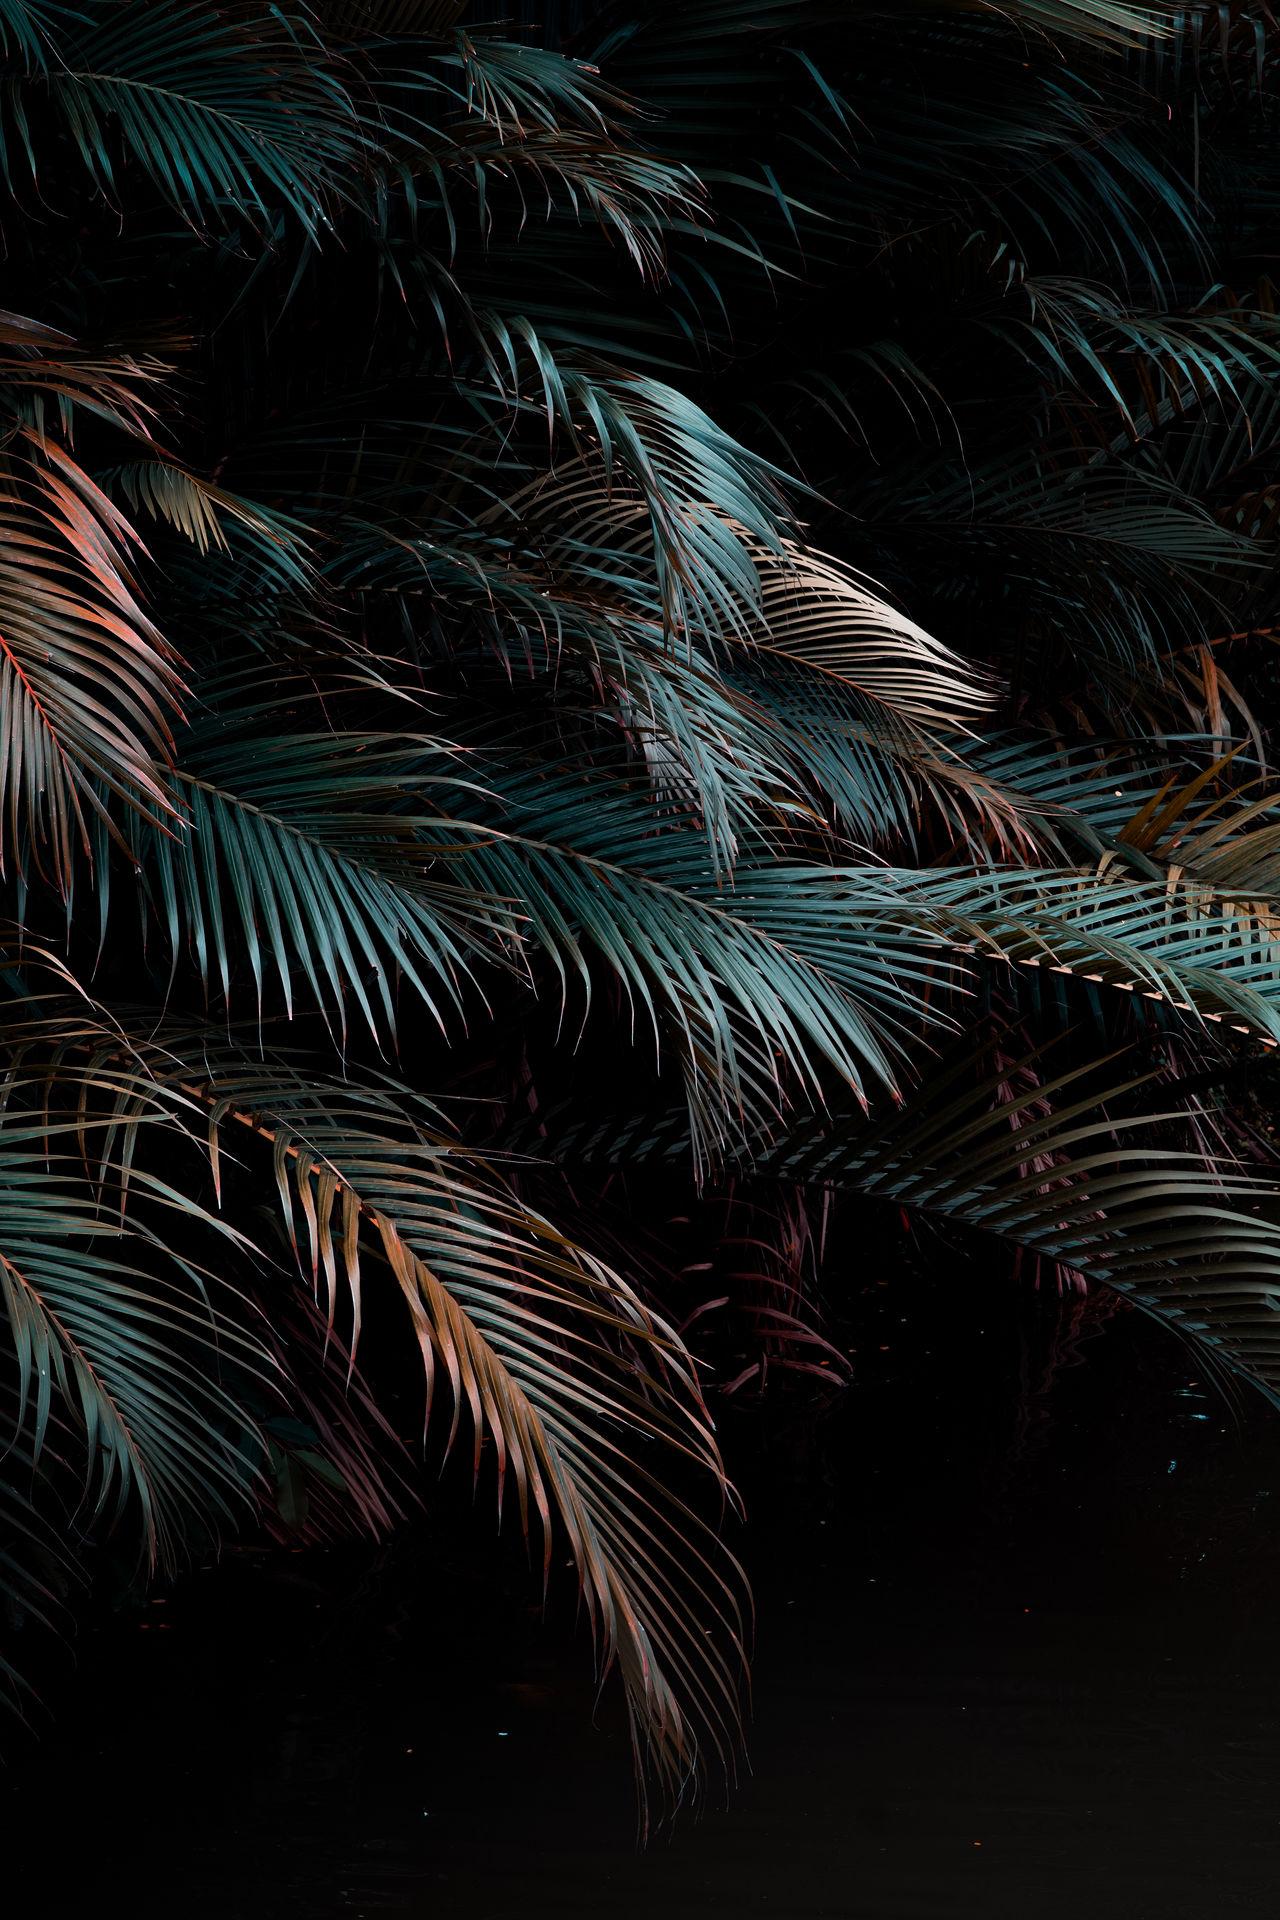 Palm tree at night